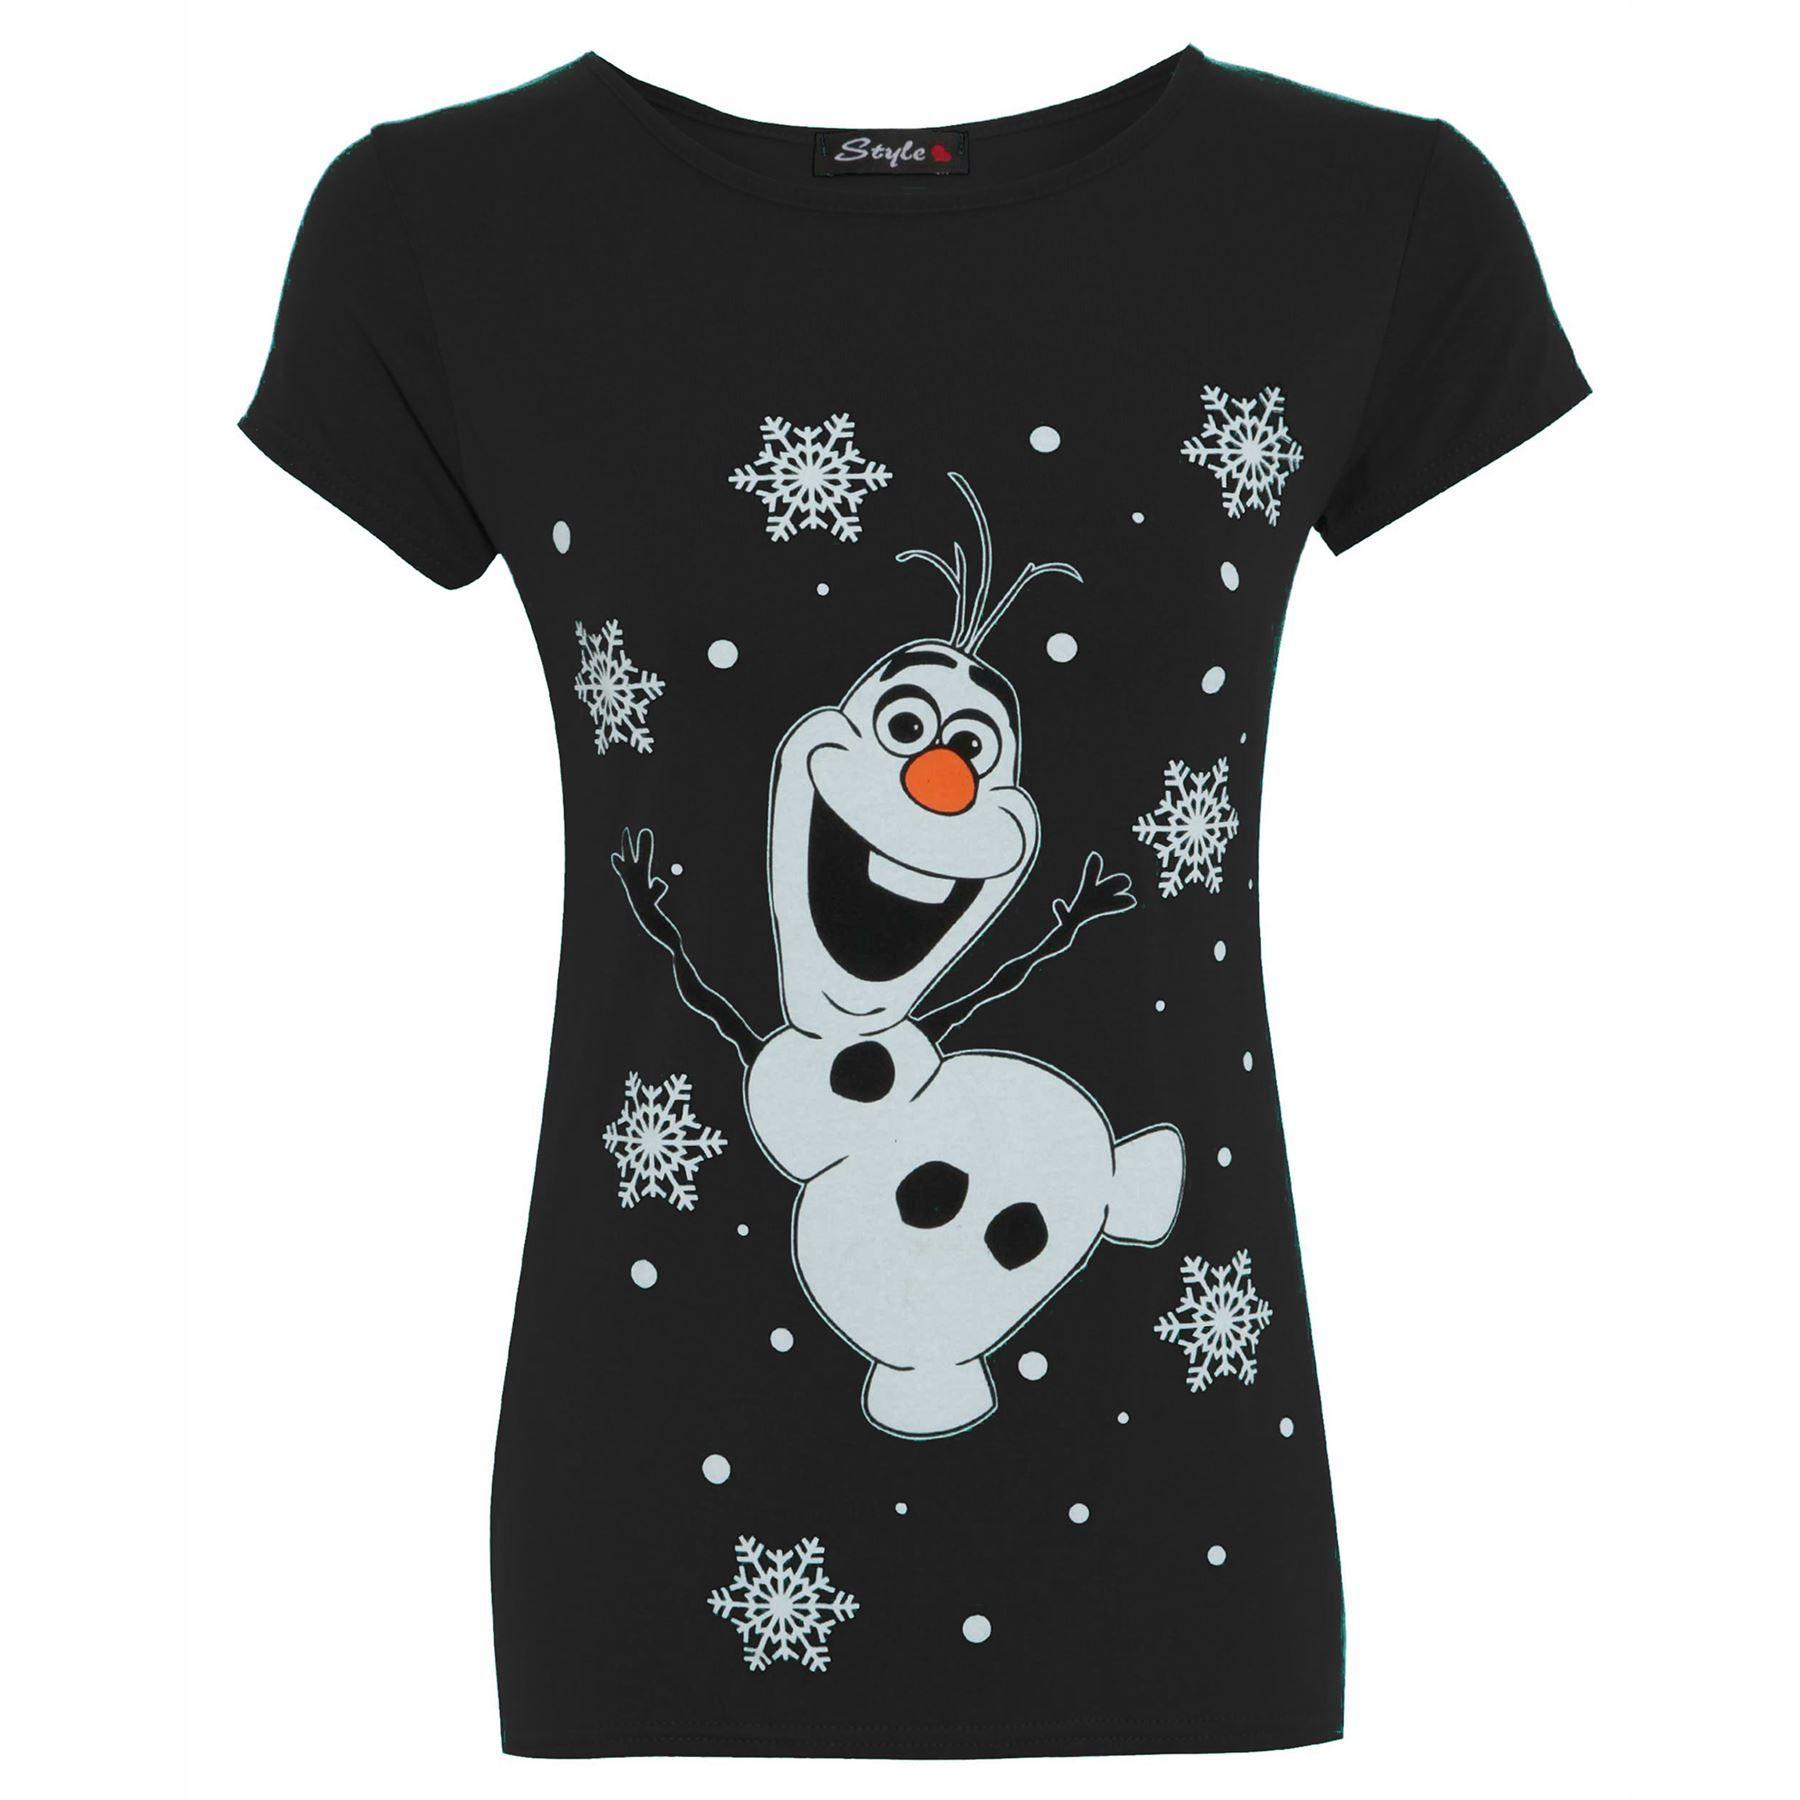 CLEARANCE SALE Womens Ladies Novelty Rudolf Olaf Frozen Christmas ...